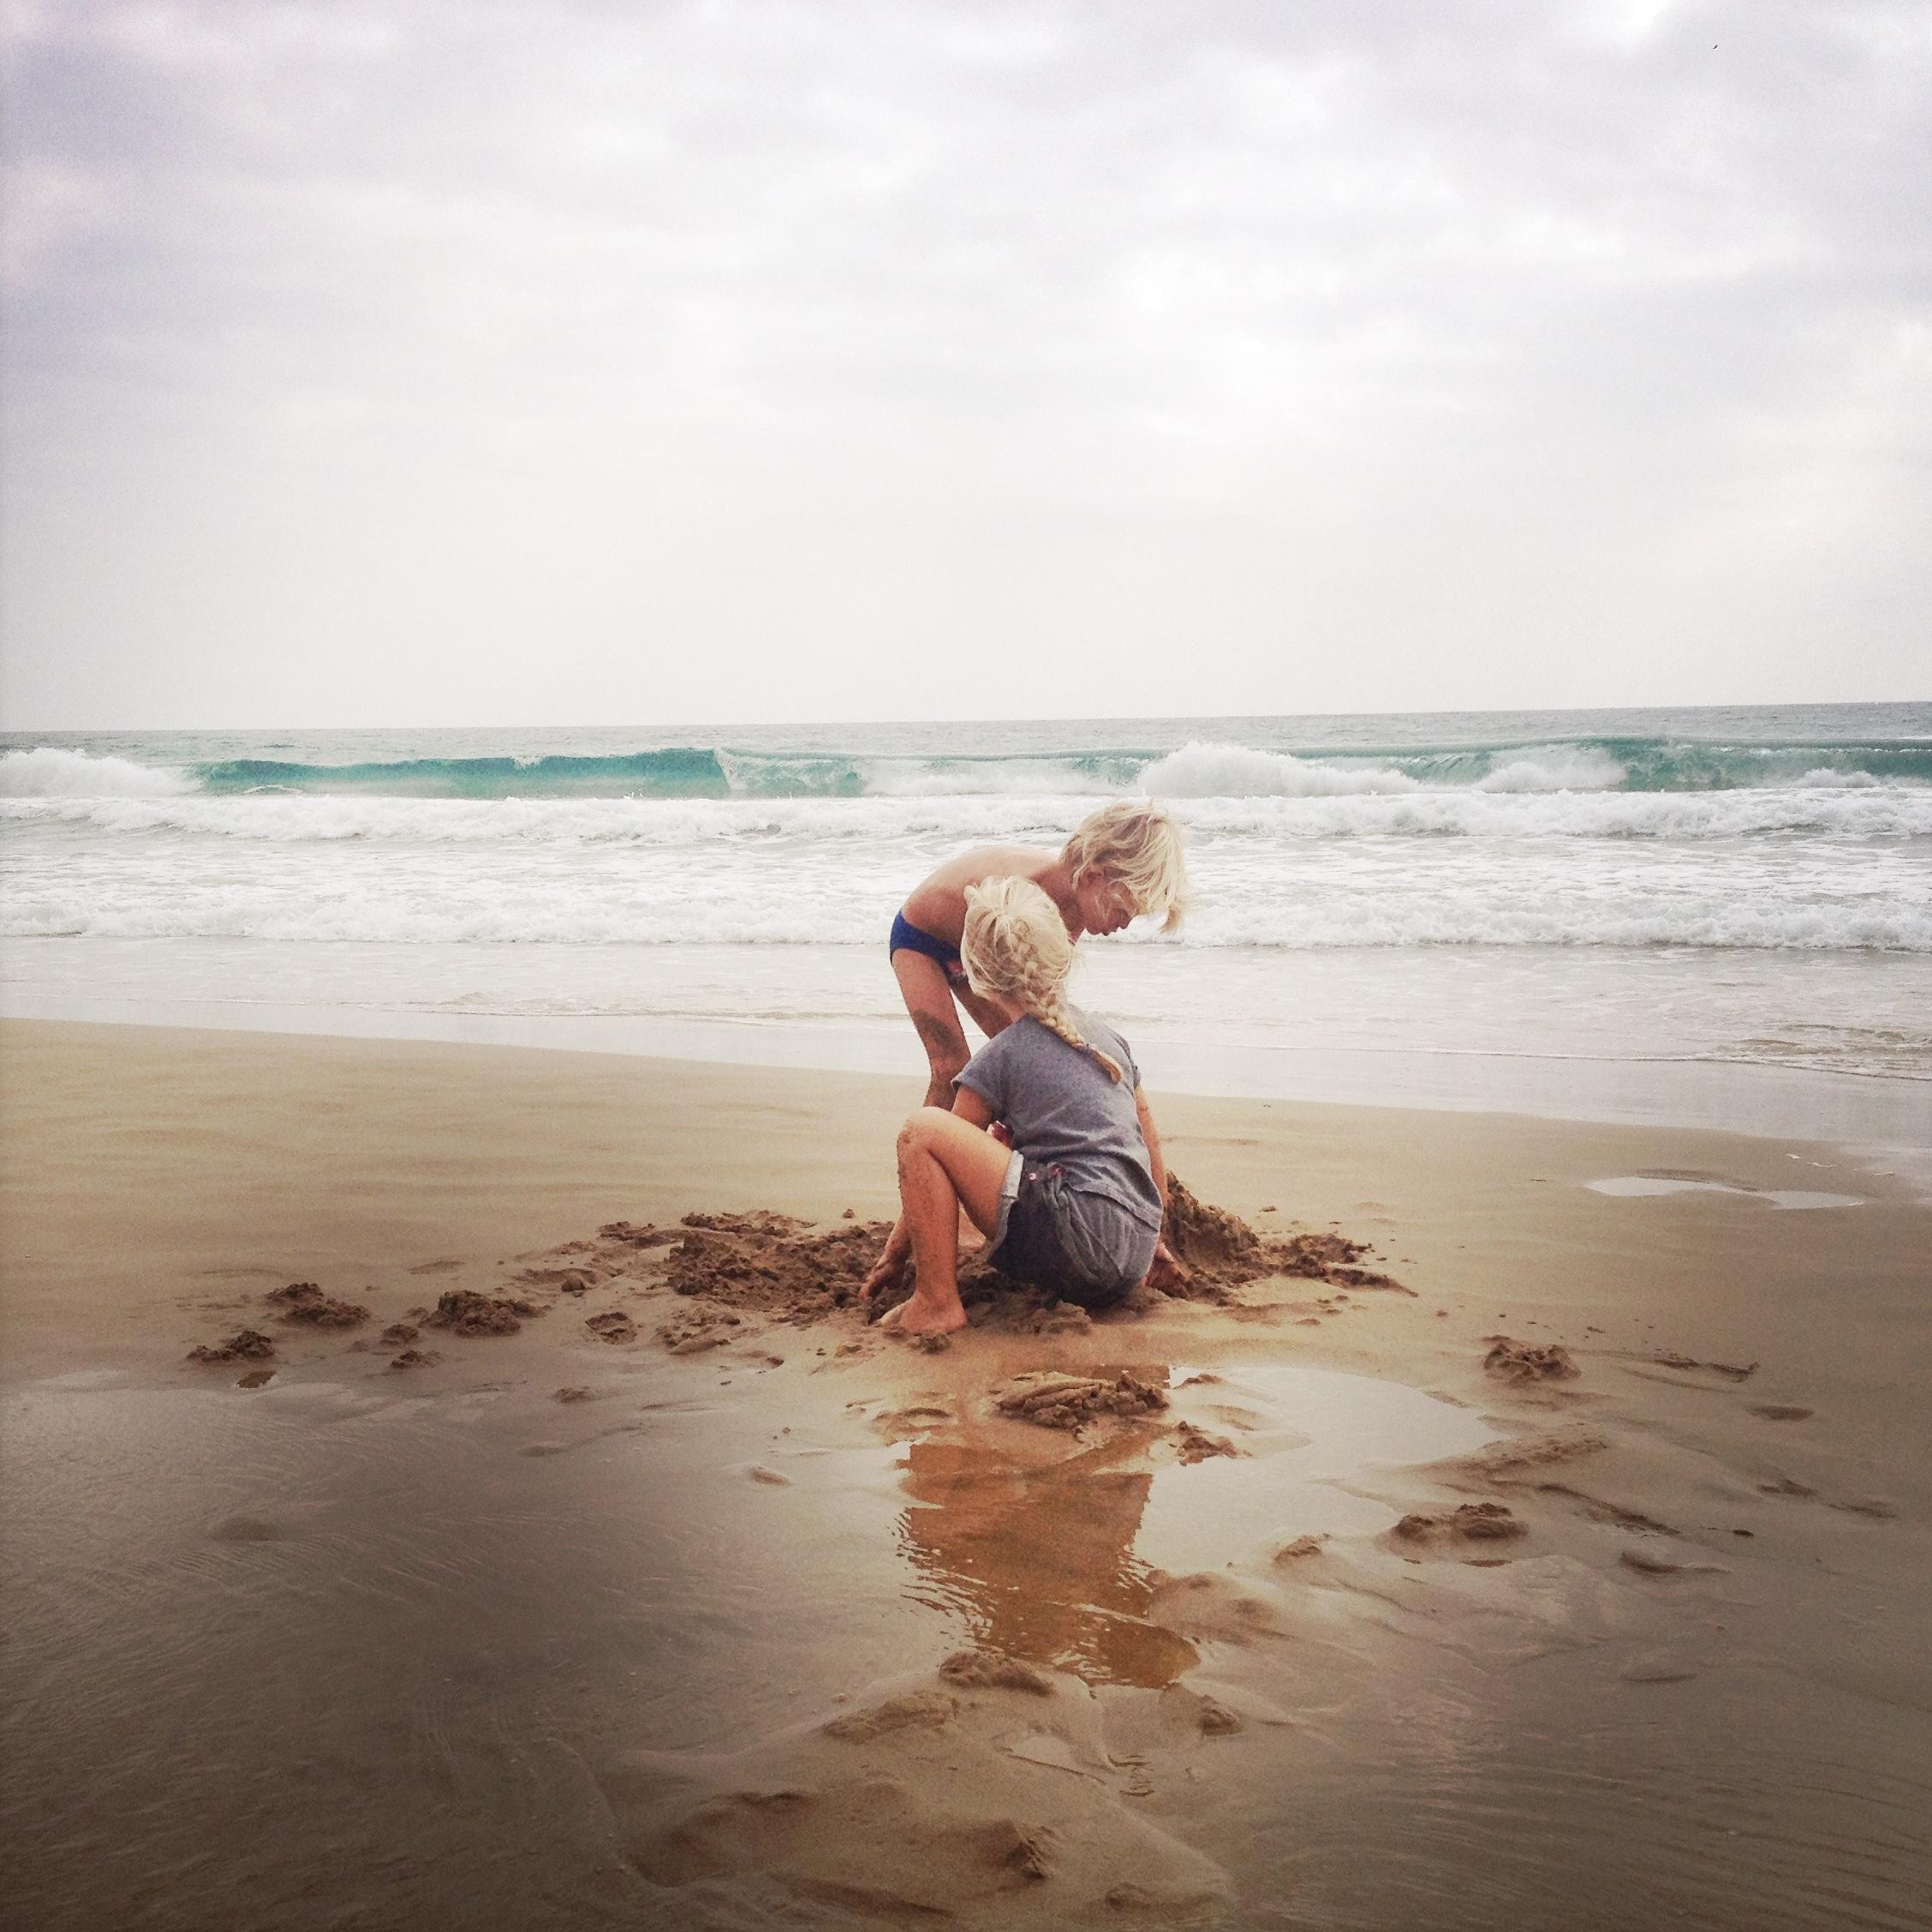 Octavi Lobo - Nens a la platja